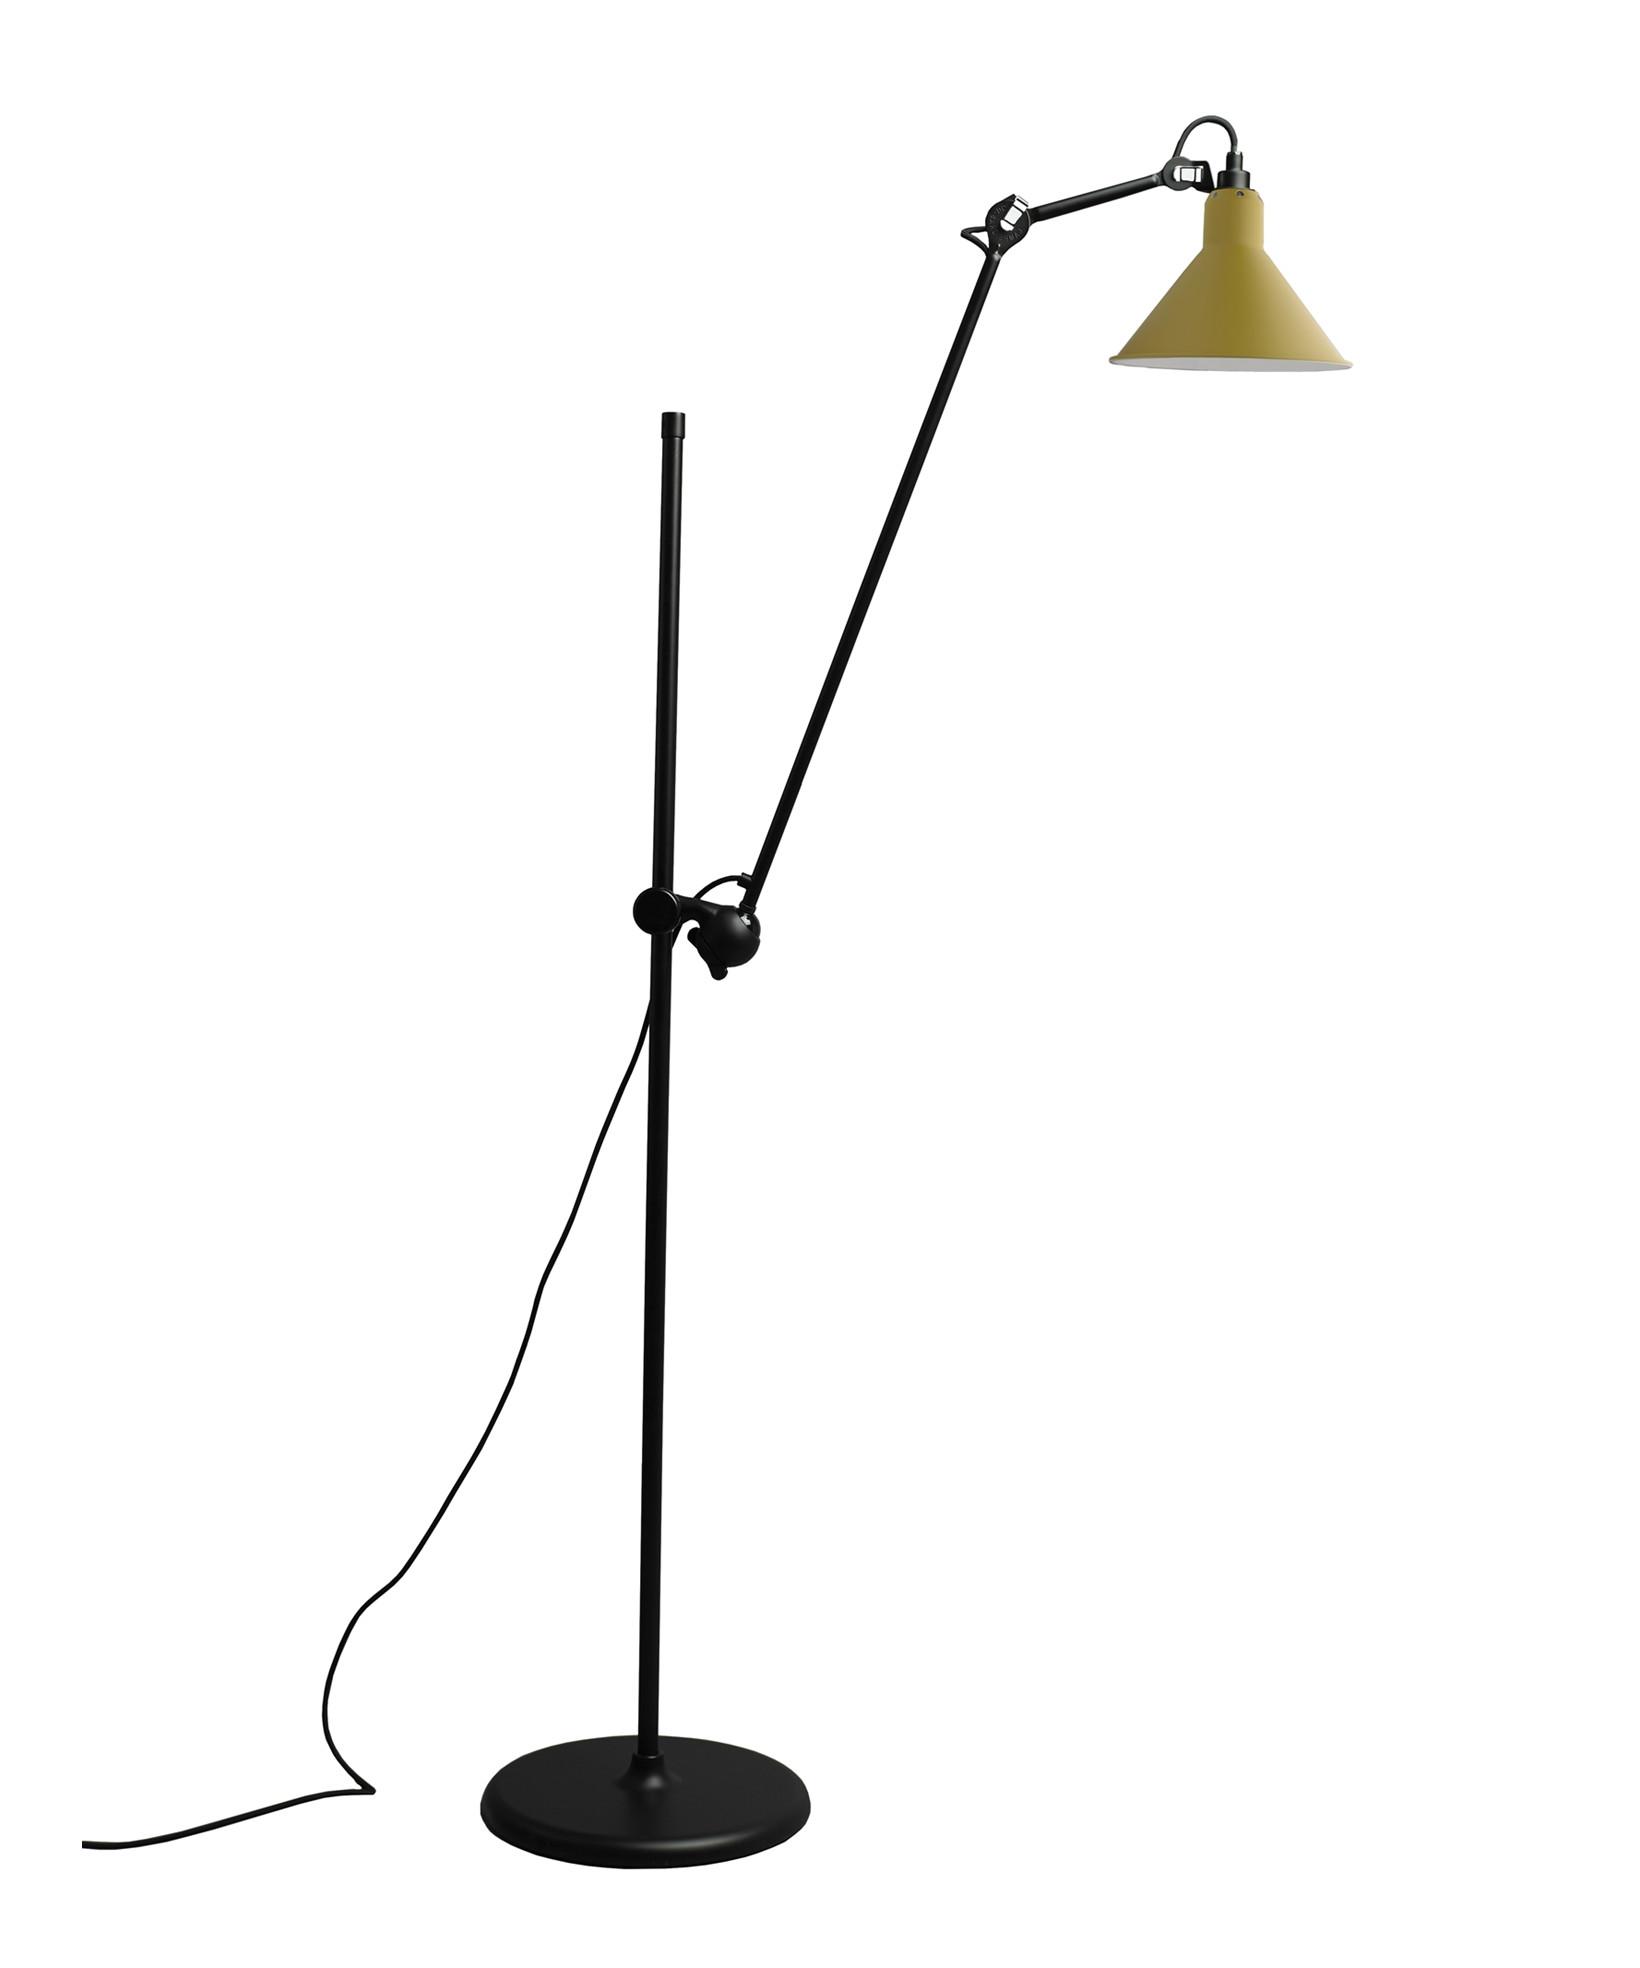 215 stehleuchte gelb lampe gras. Black Bedroom Furniture Sets. Home Design Ideas